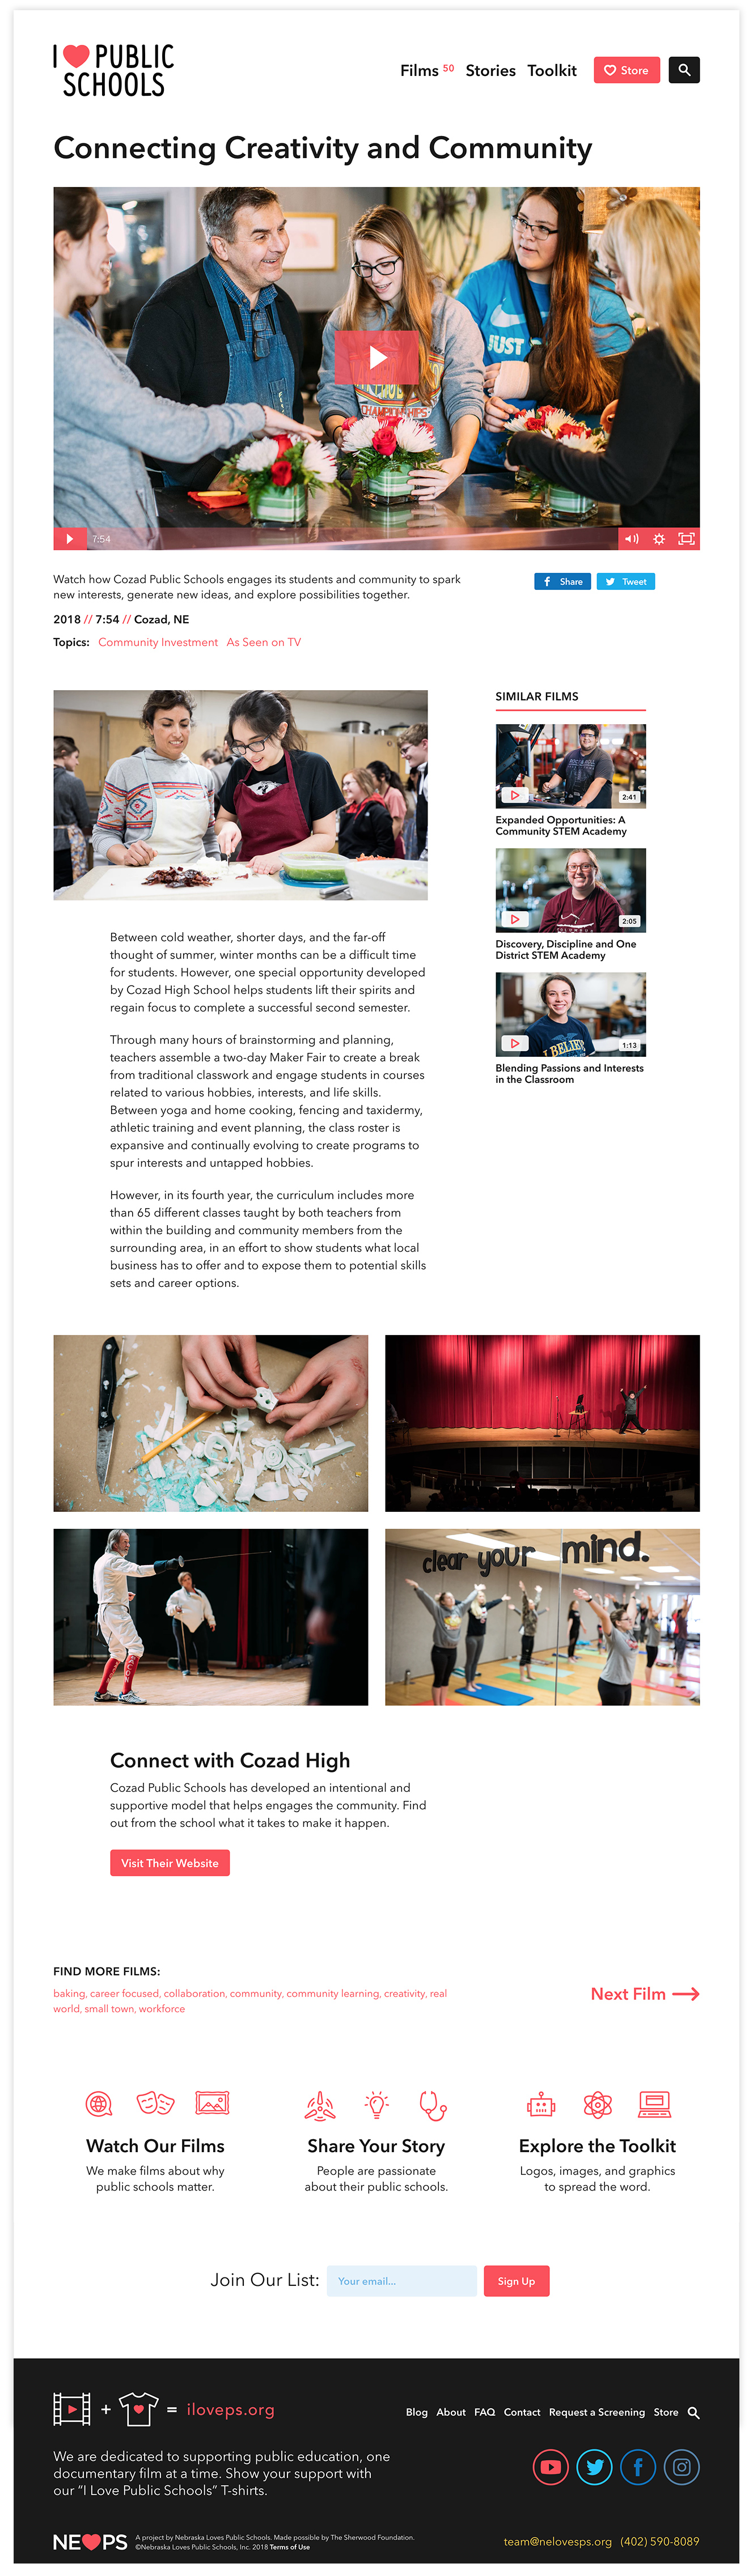 jkdc_ilovepublicschools-film-creativity.jpg